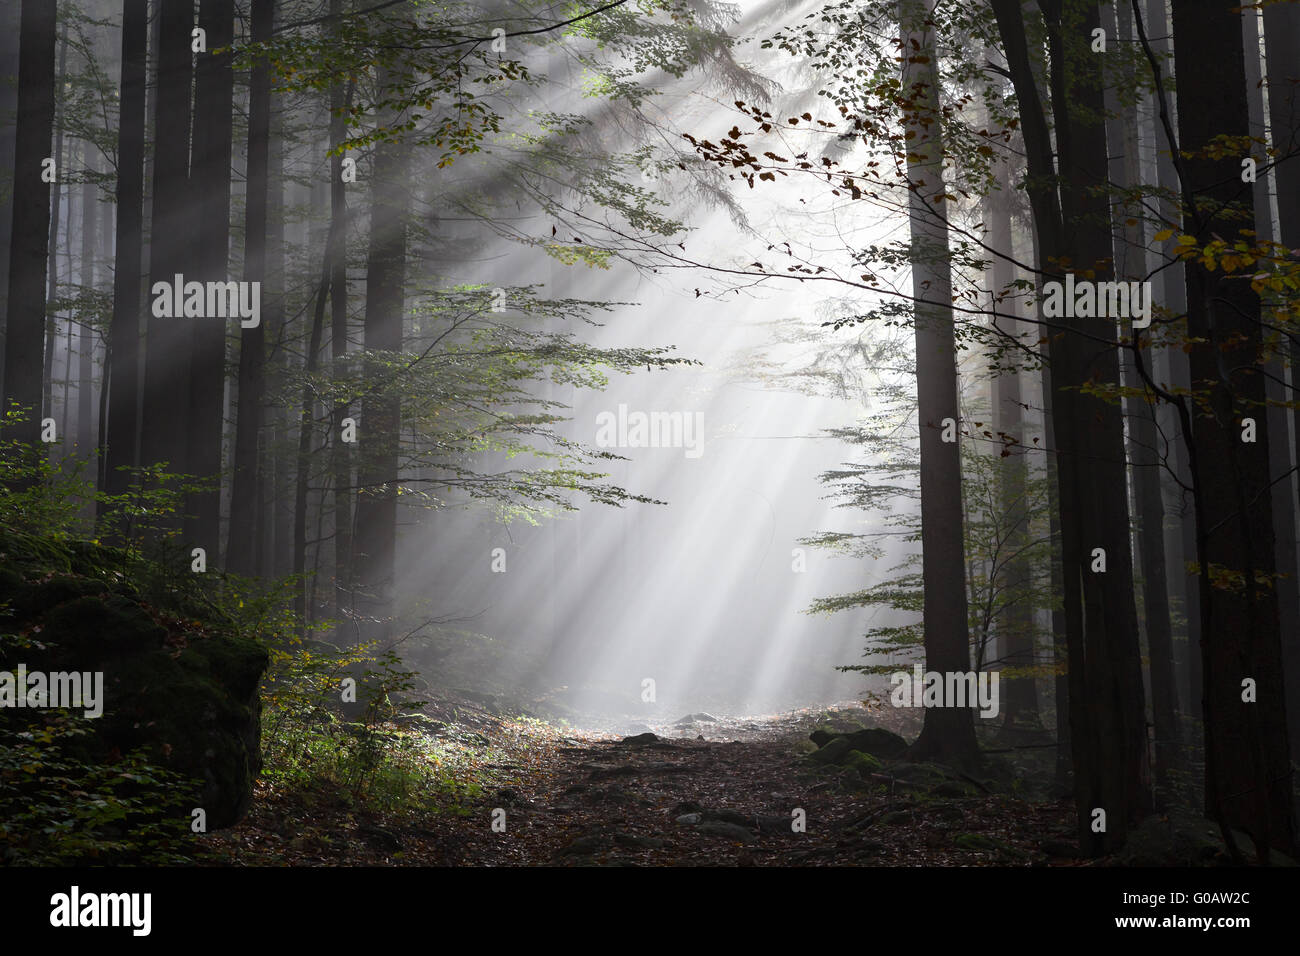 Light and shadow - Stock Image